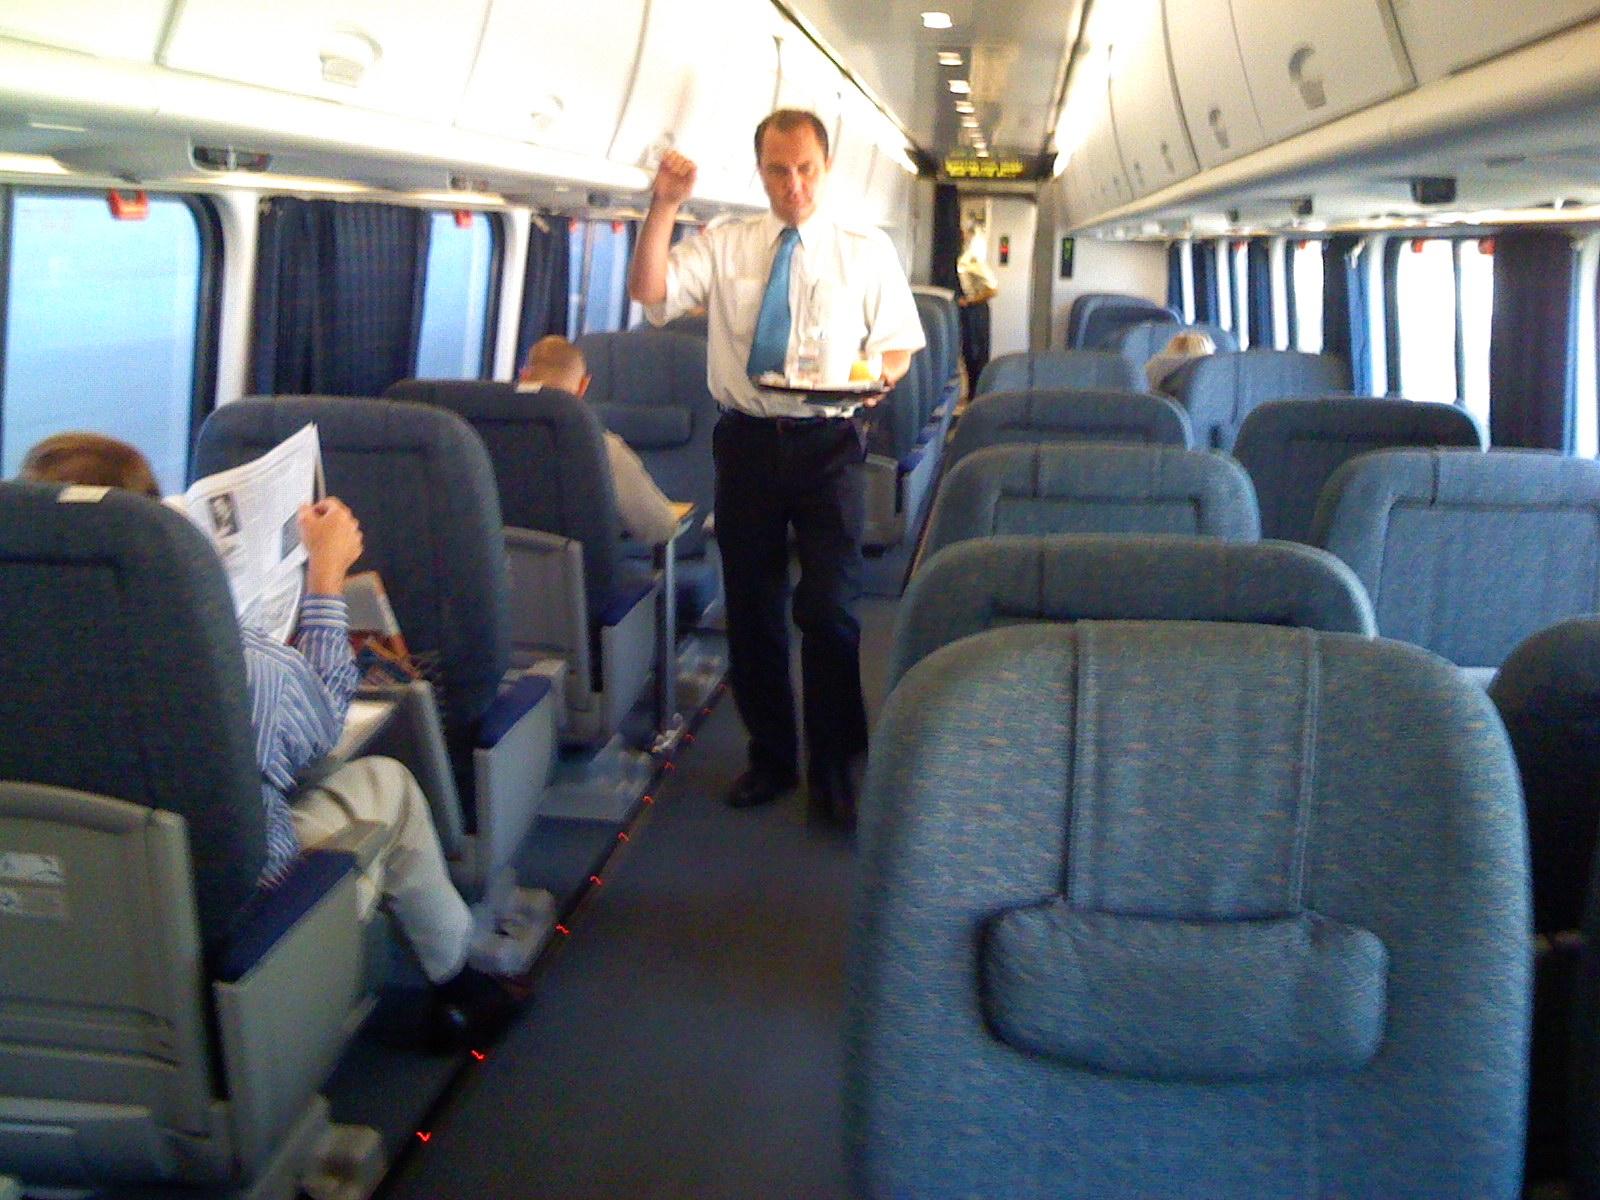 Amtrak Cancels Acela Service Between Boston and New York Through Sunday